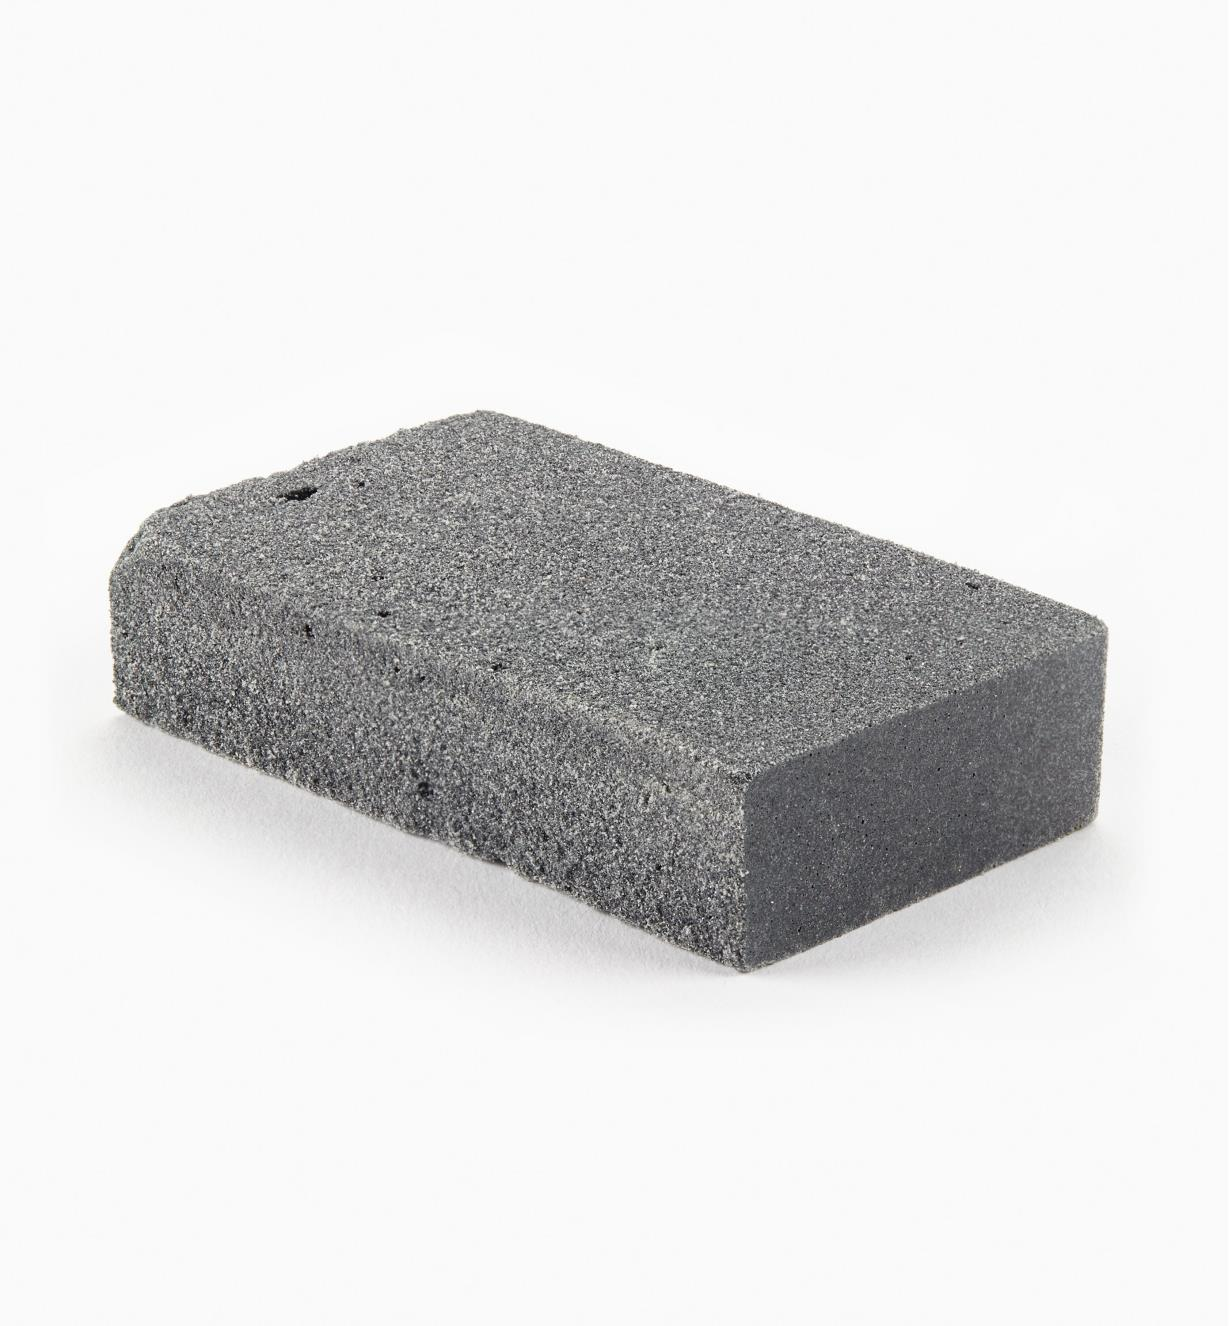 BR202 - Rust Eraser, Medium